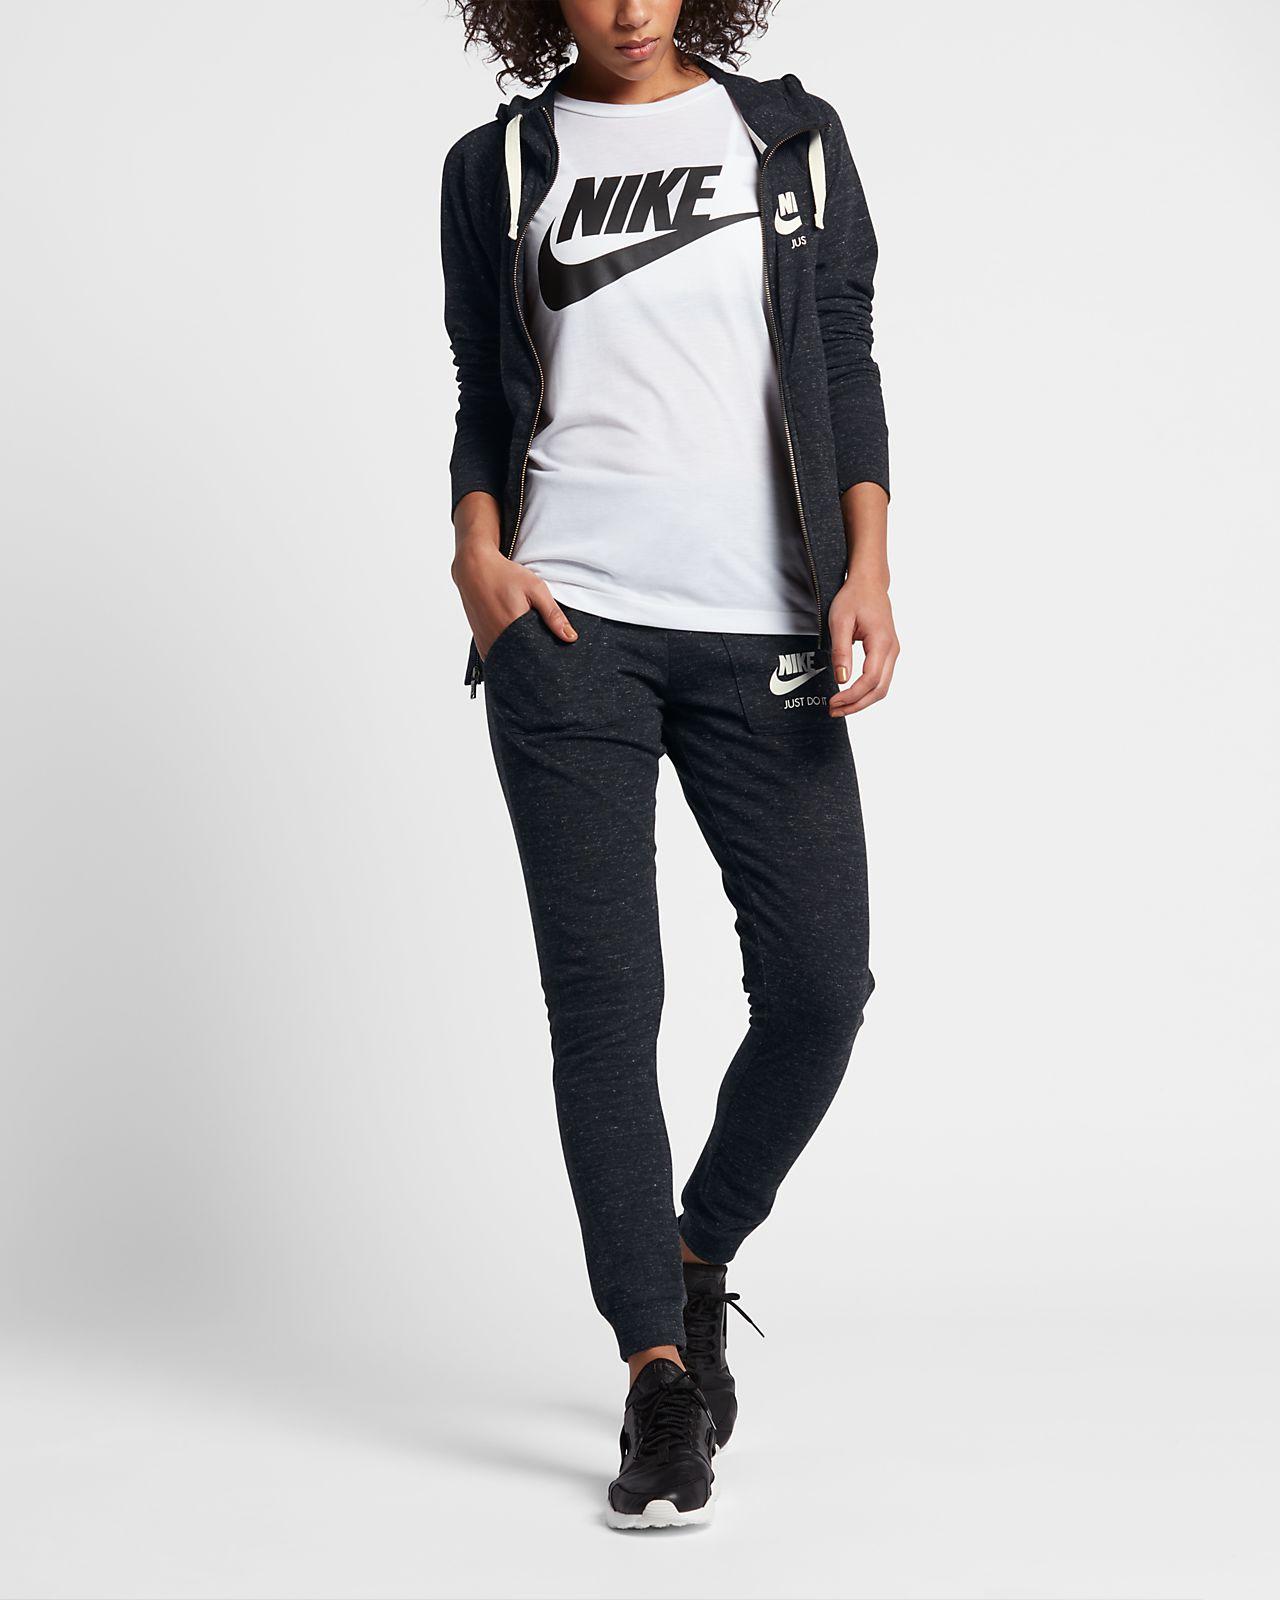 cdd5ffb8 Nike Sportswear Gym Vintage hettejakke for dame. Nike.com NO